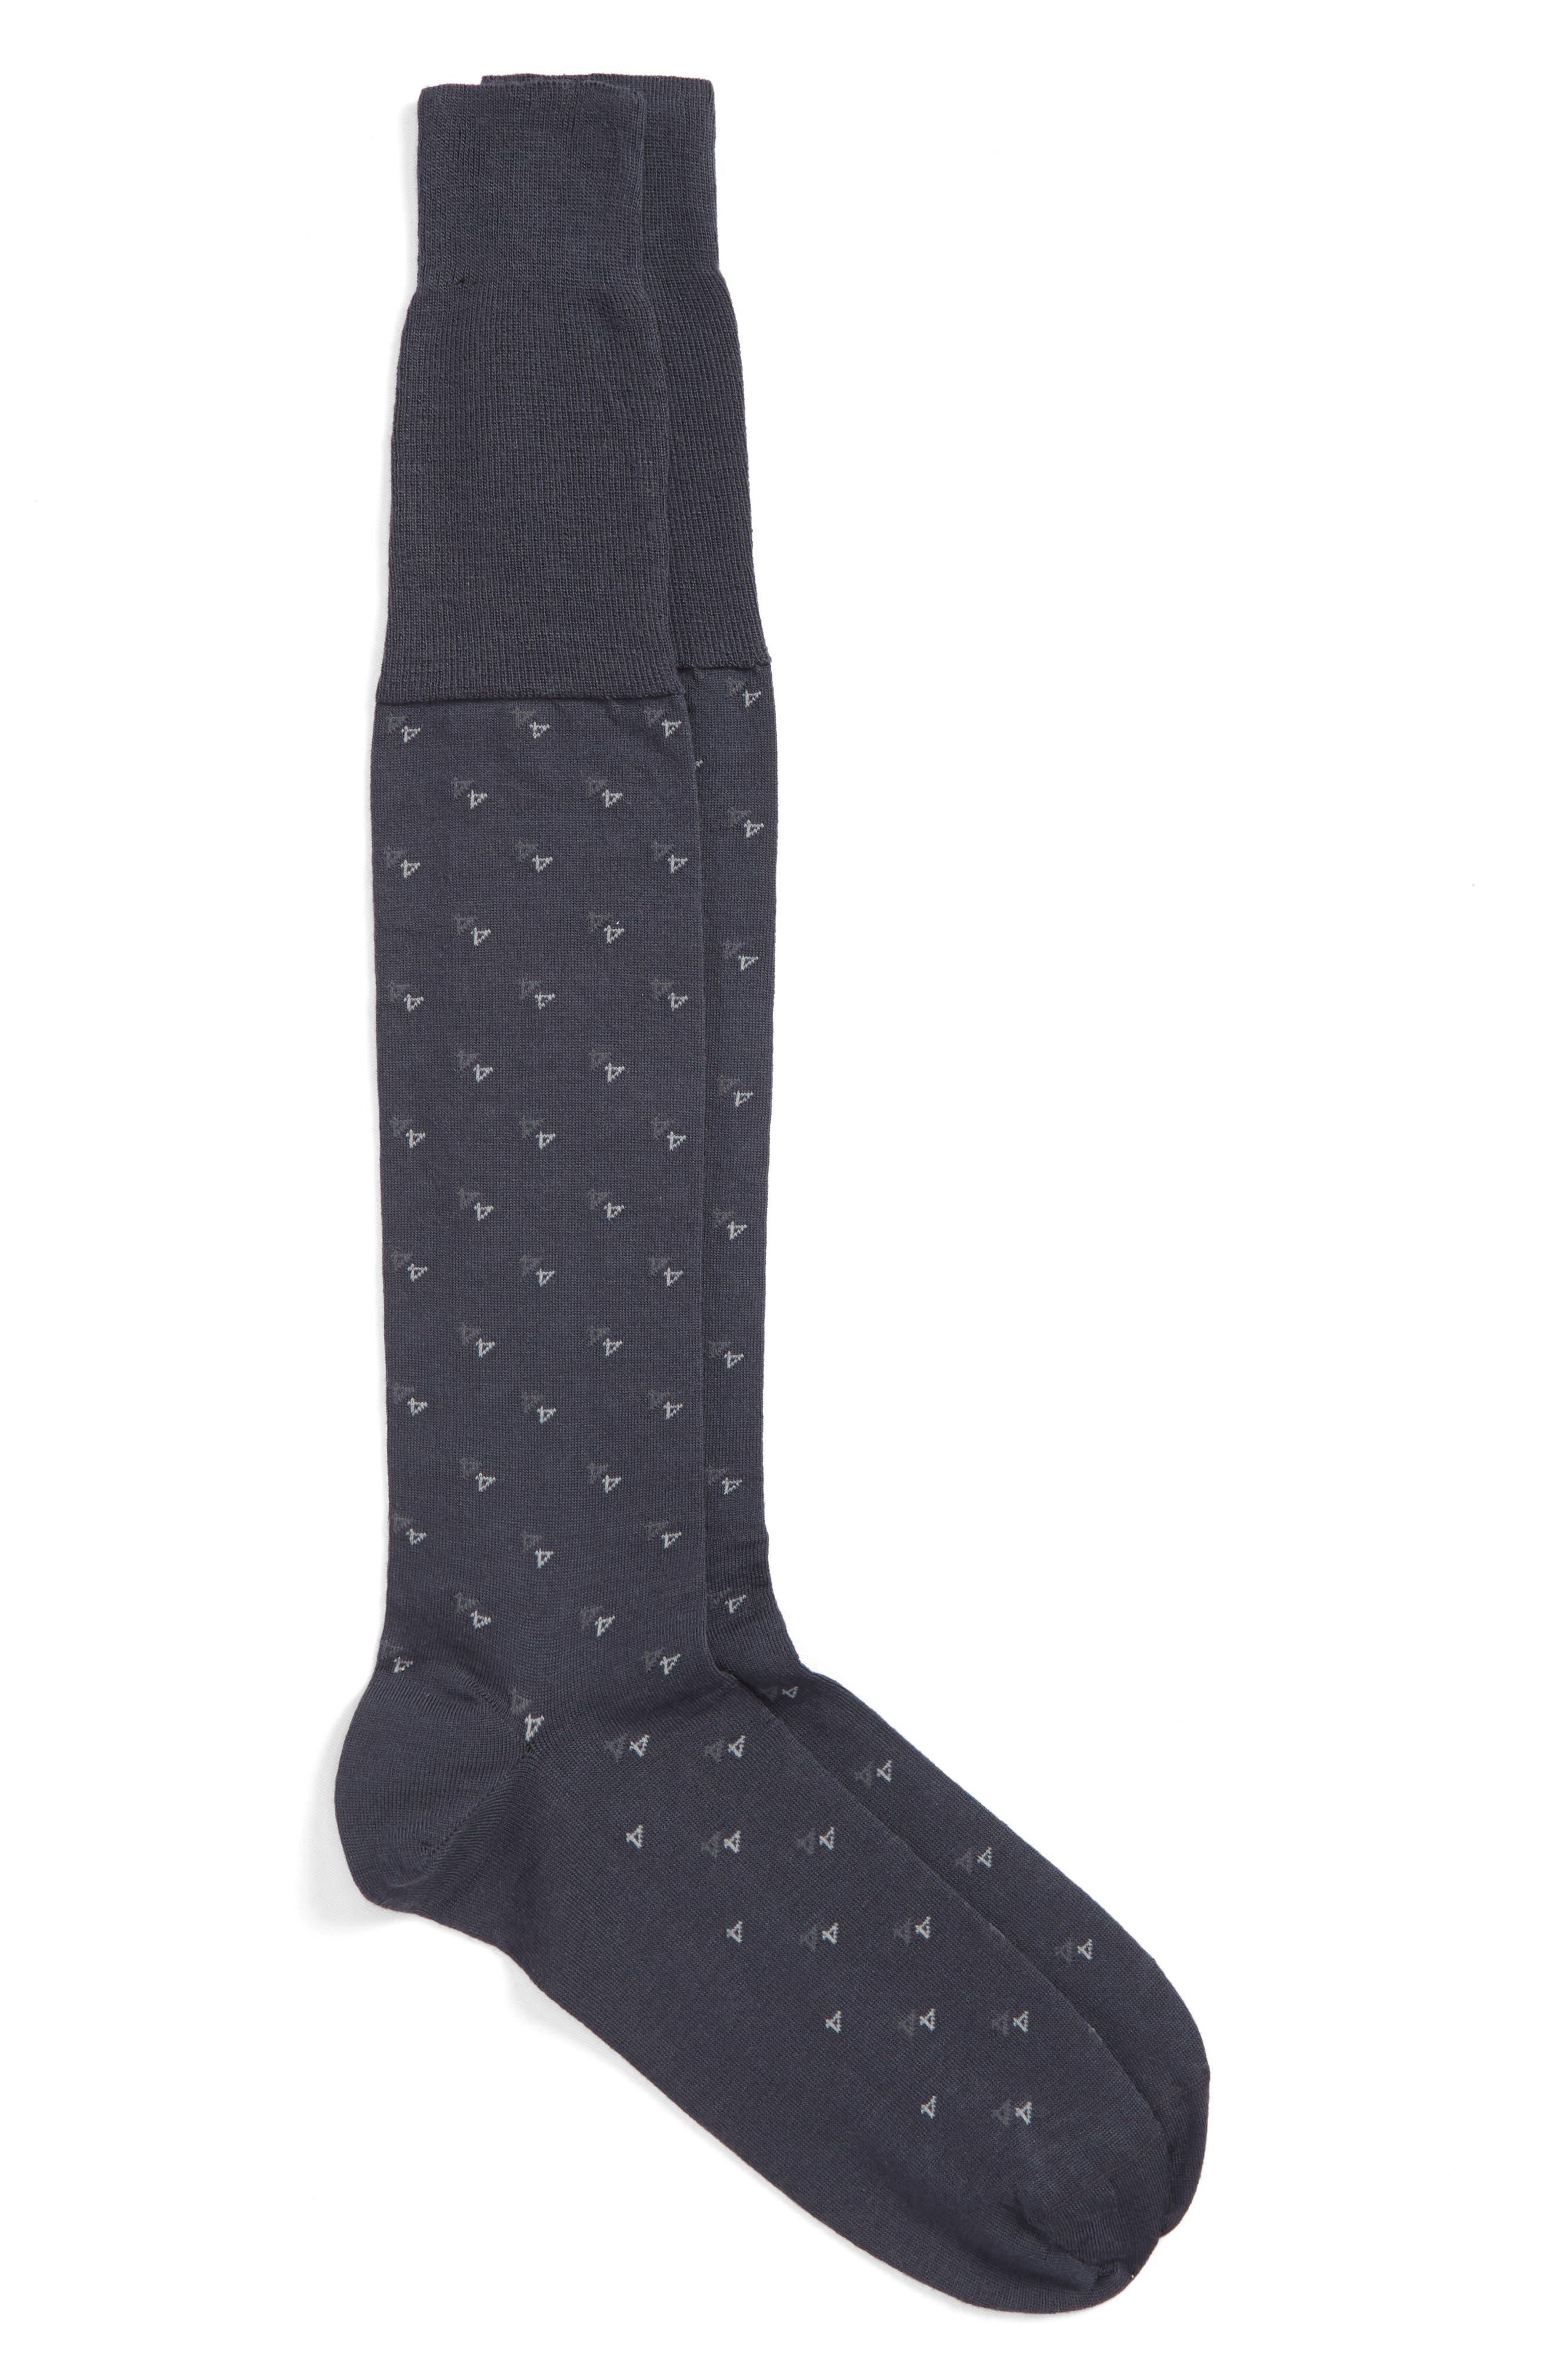 Geometric Over-the-Calf Socks,                         Main,                         color, 410